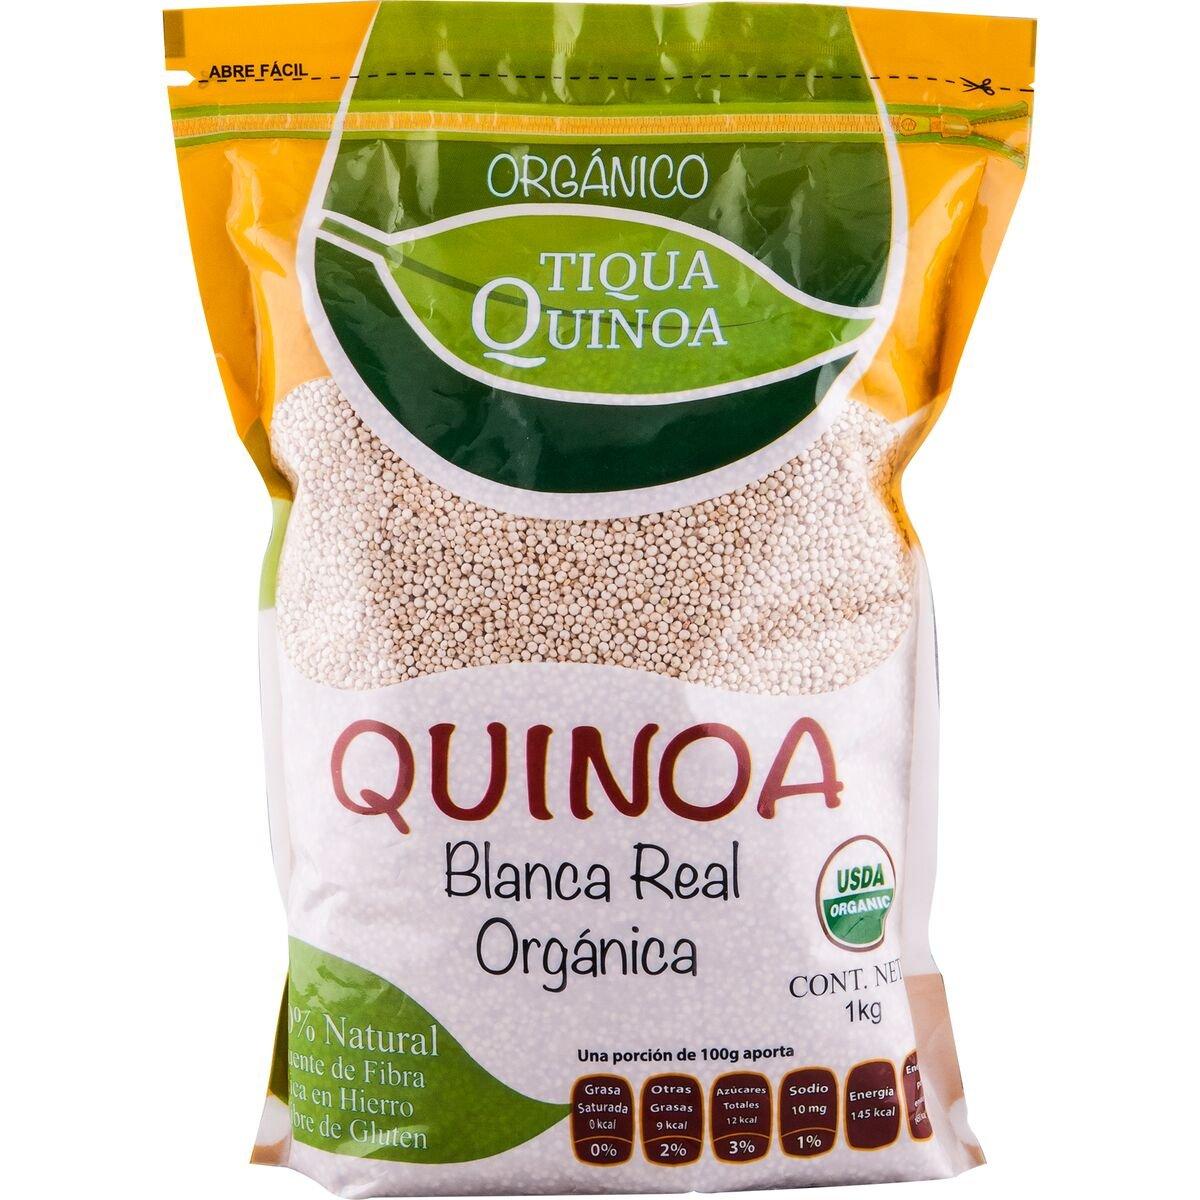 Amazon.com : Tiqua Quinoa Organic White Royal Quinoa, 1.1 Pound : Grocery & Gourmet Food